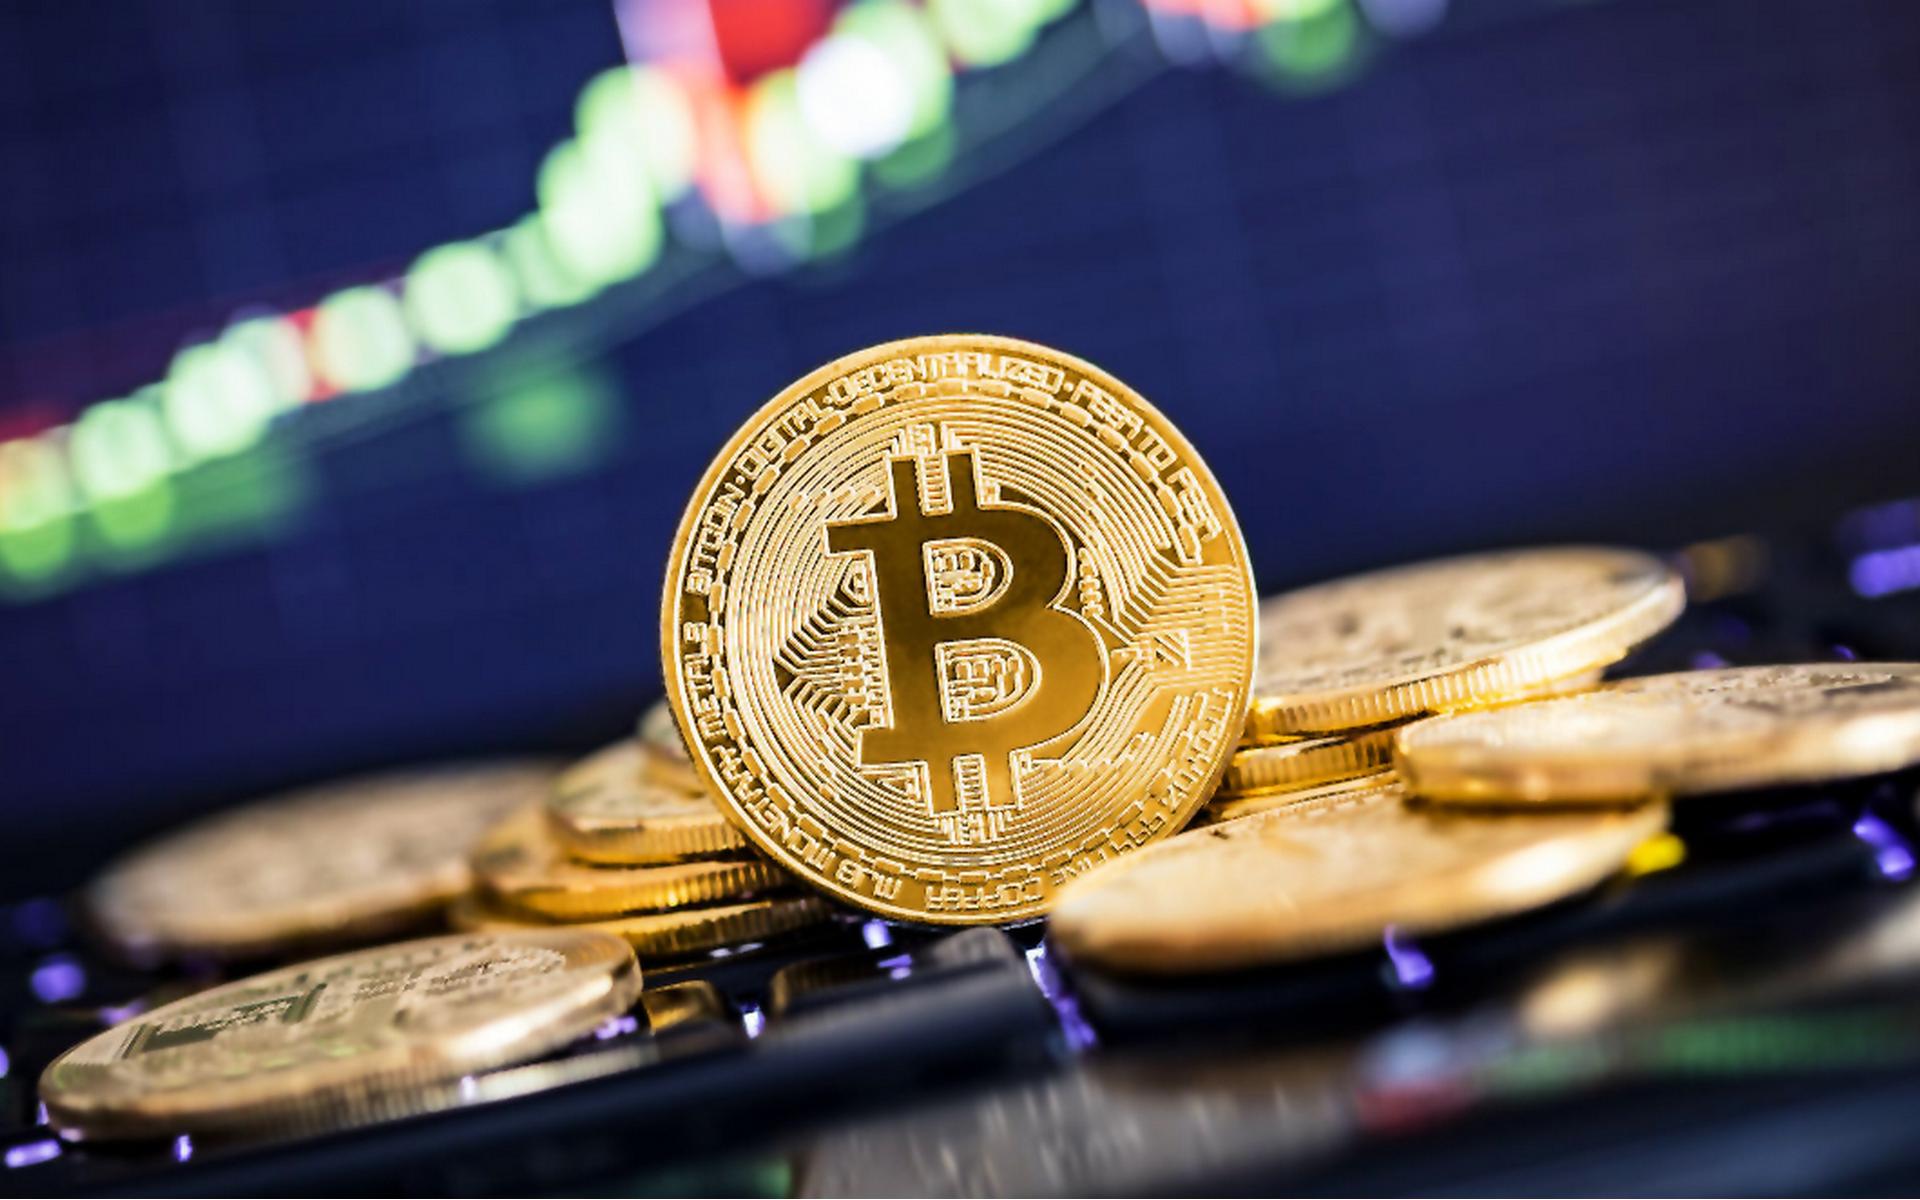 Bitcoin is amazing